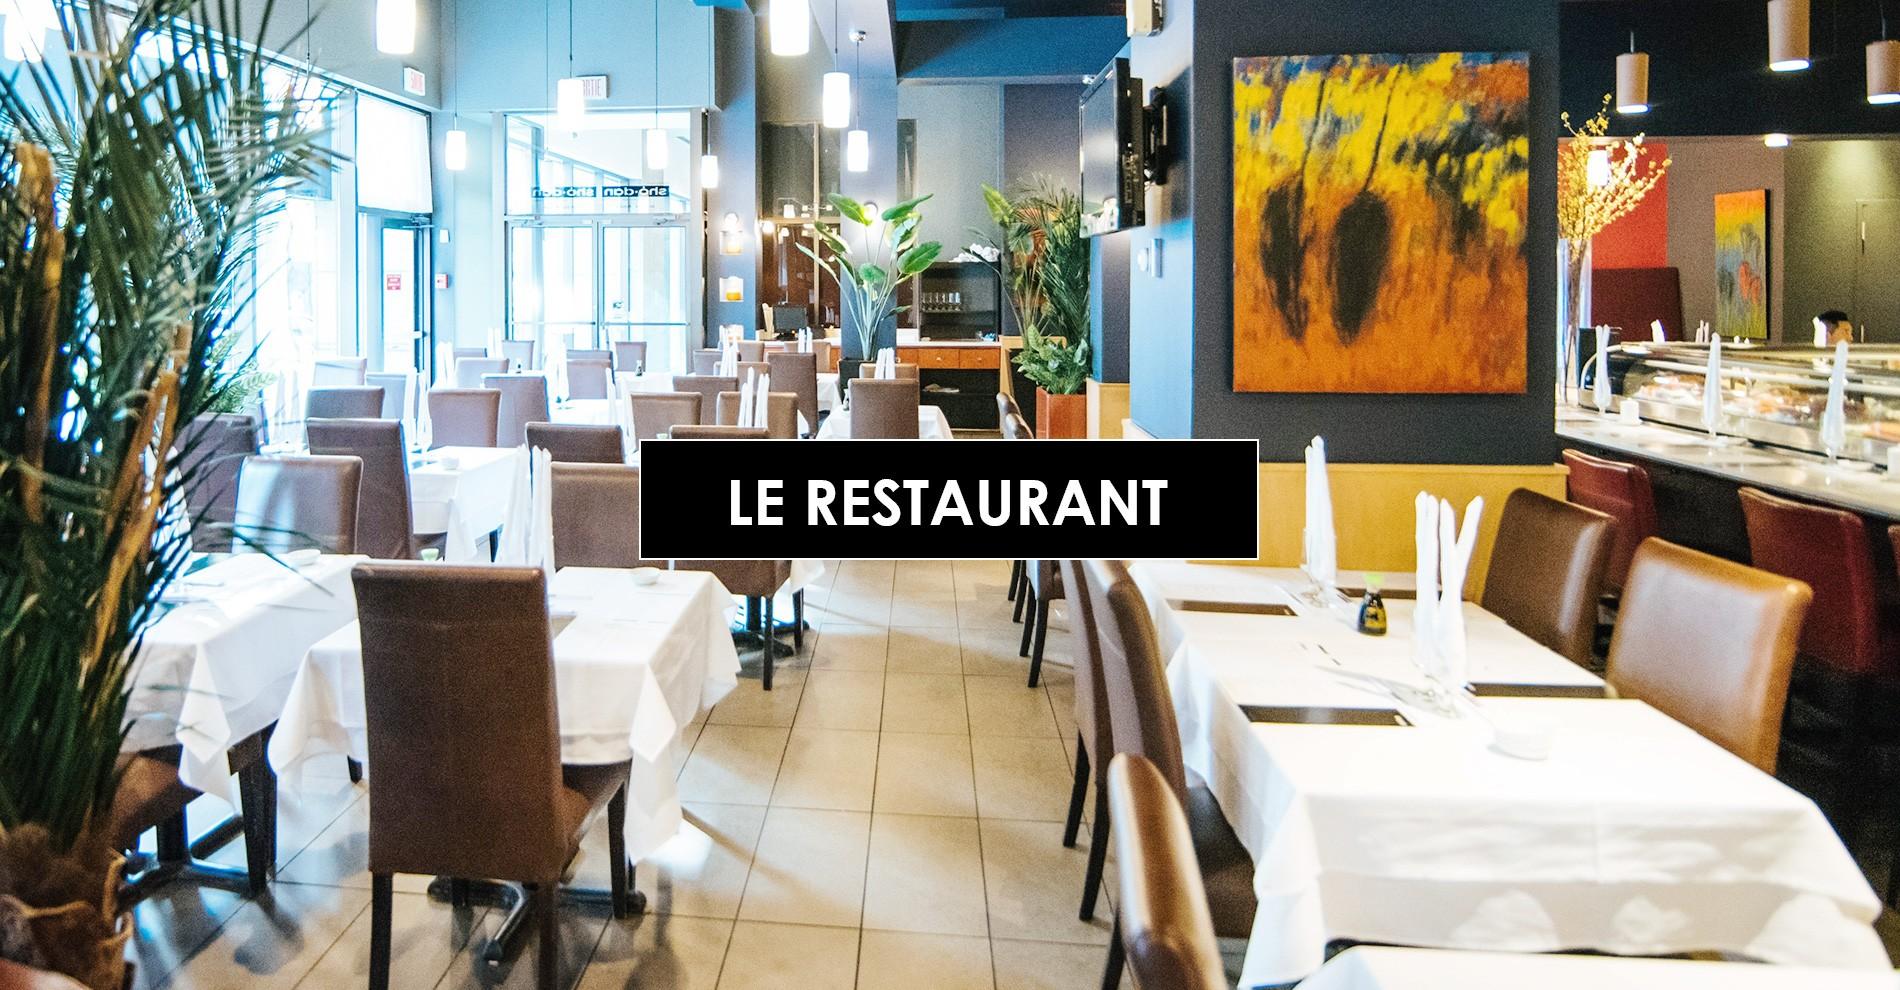 Le Restaurant Le Restaurant Fr